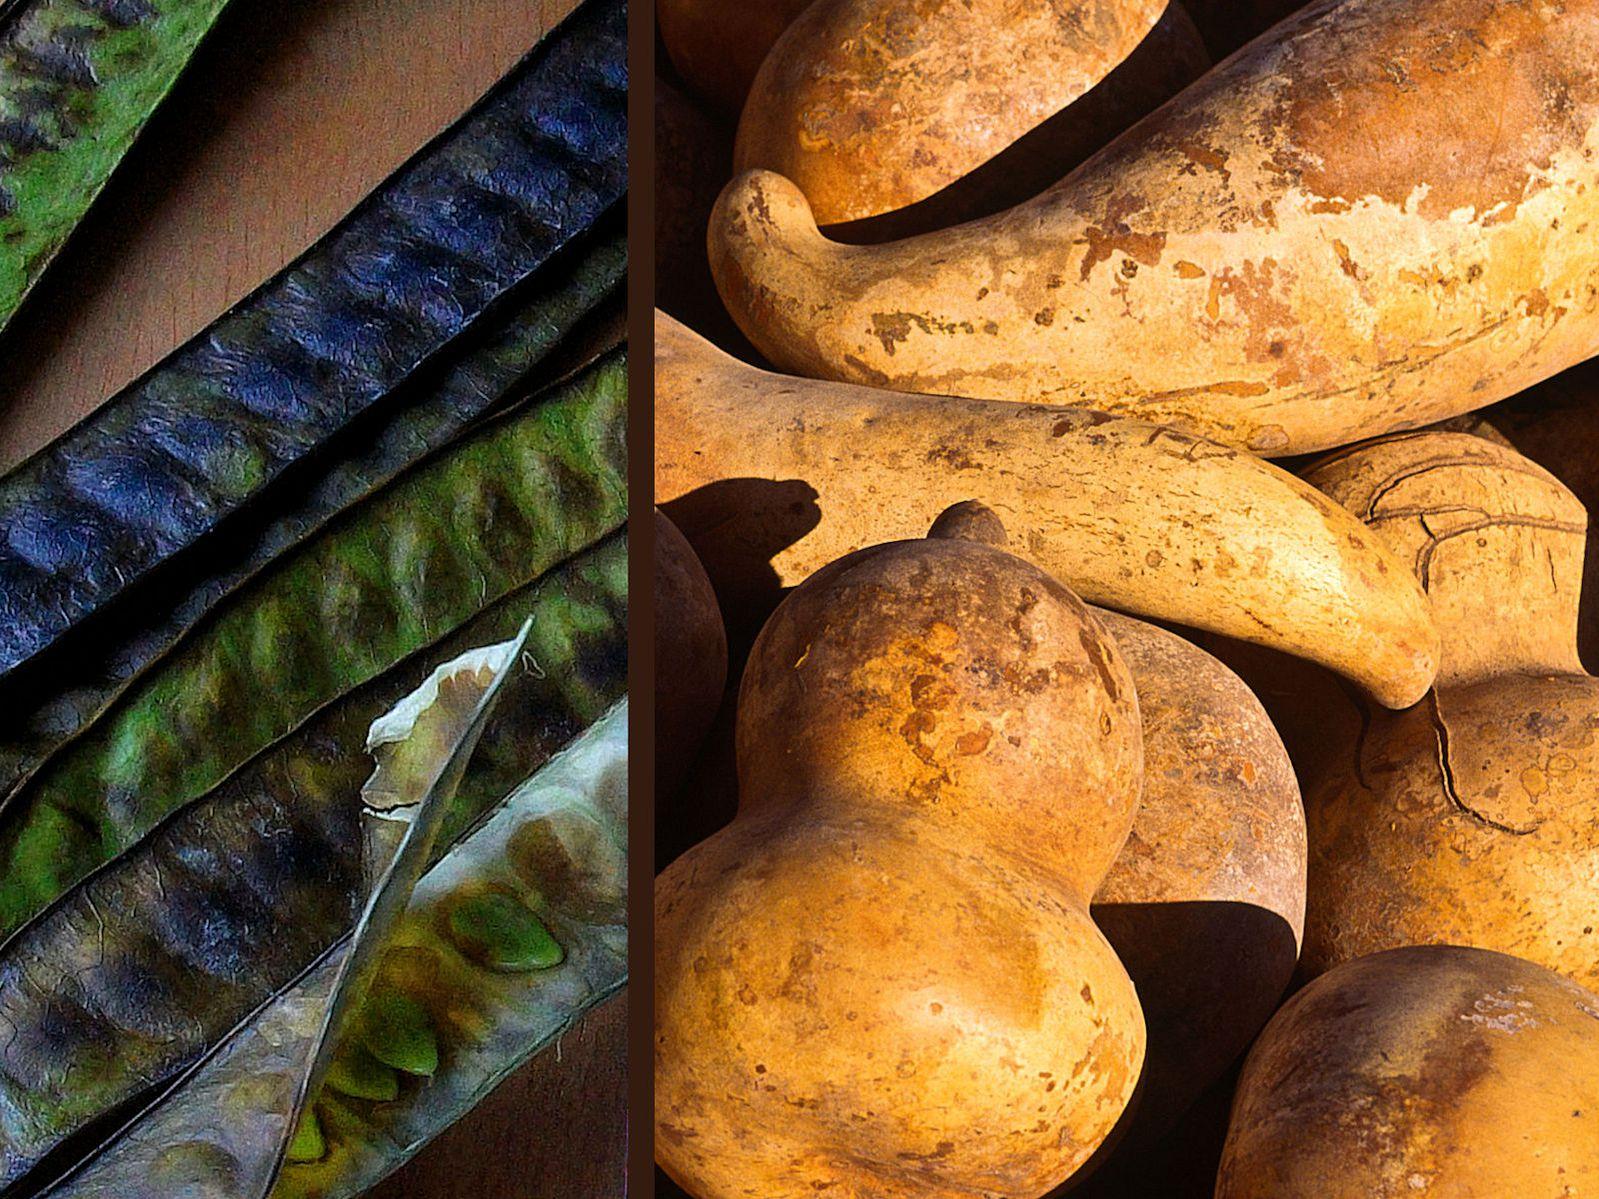 hierbas para adelgazar rapido en chile seco